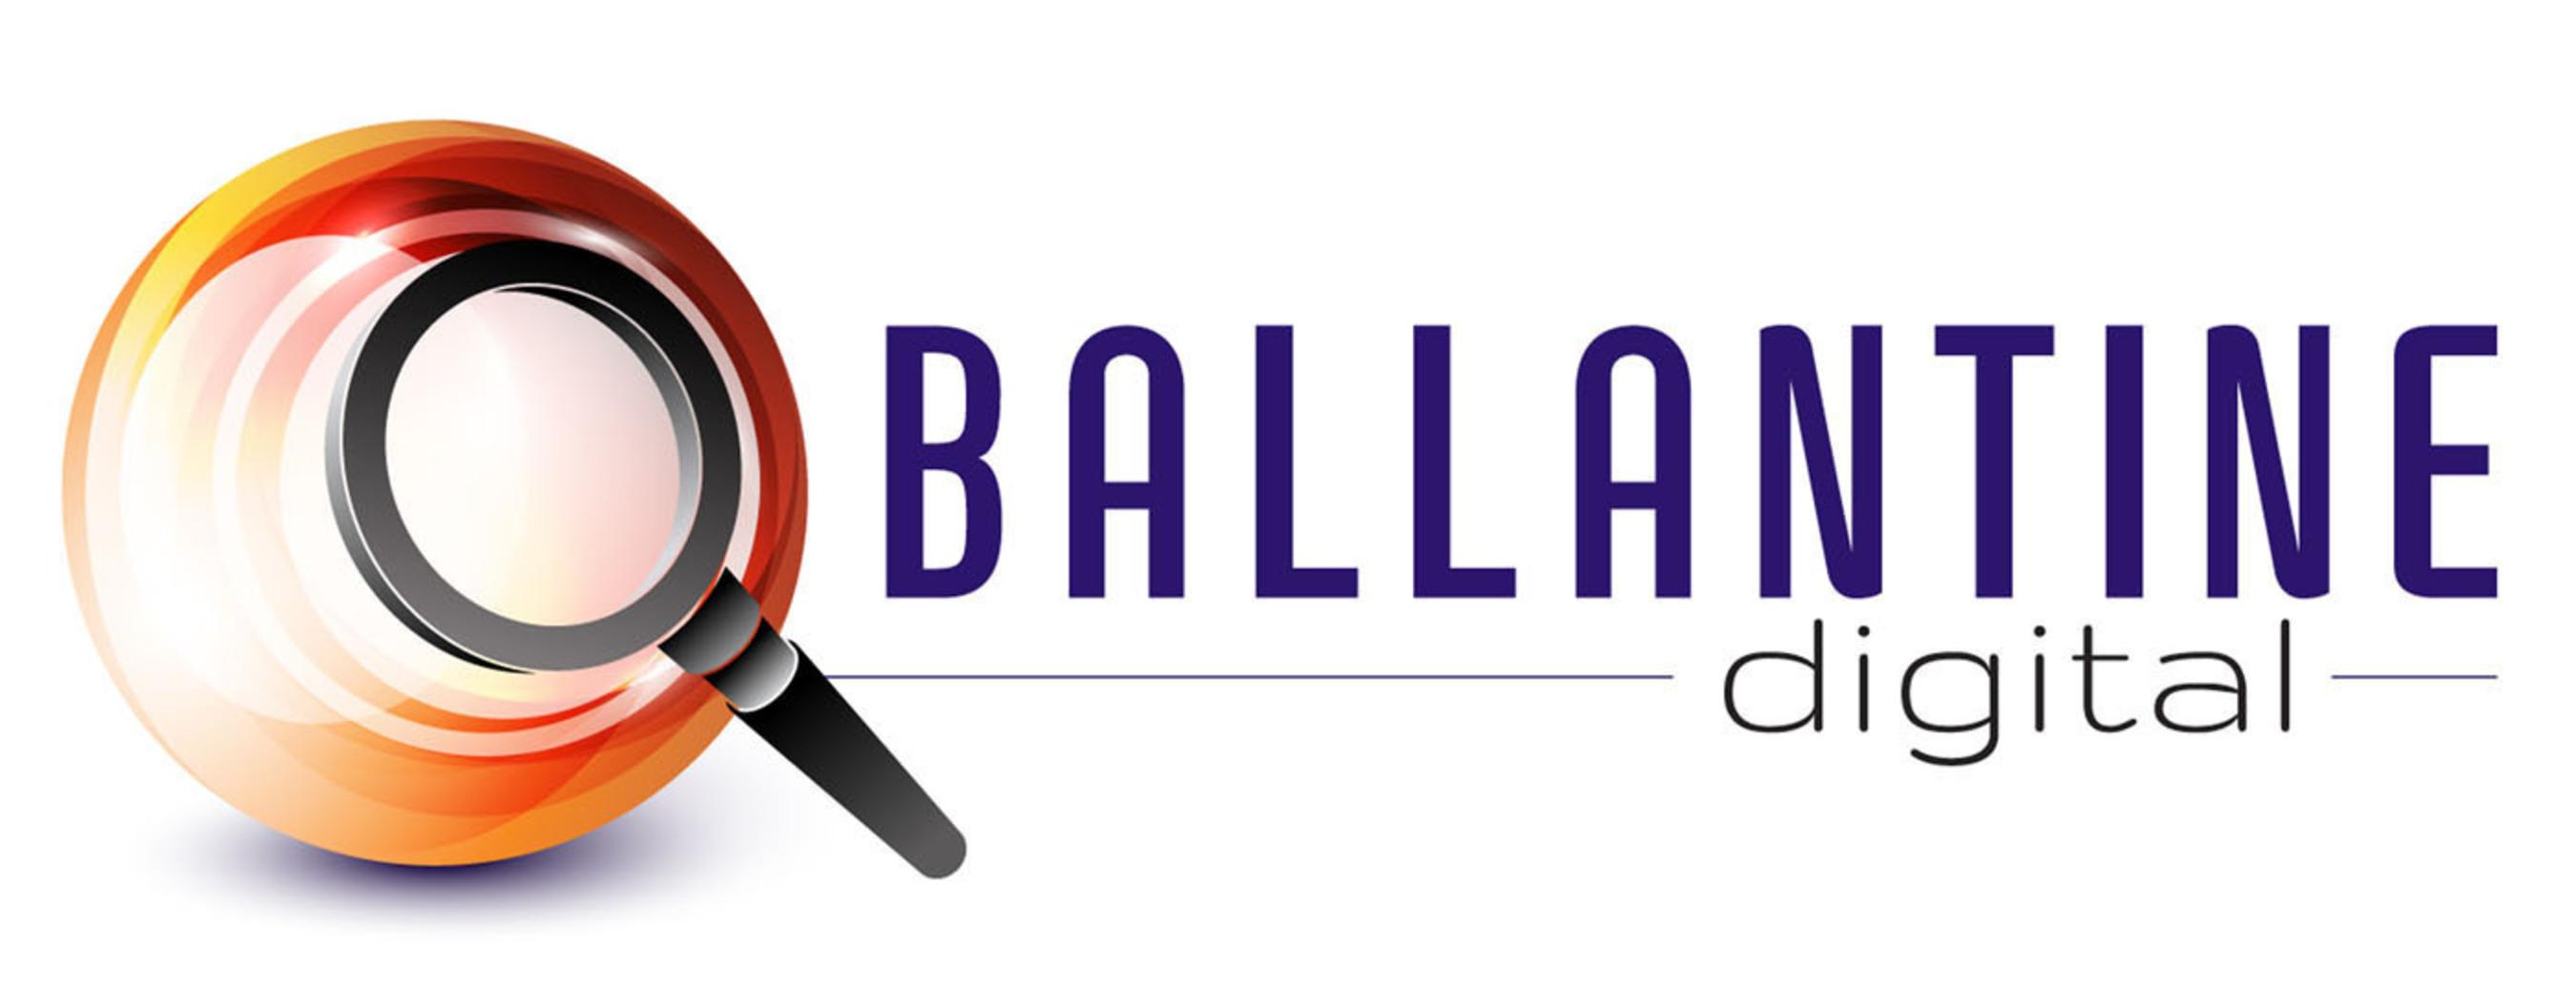 Ballantine Digital. (PRNewsFoto/Ballantine Digital) (PRNewsFoto/BALLANTINE DIGITAL)